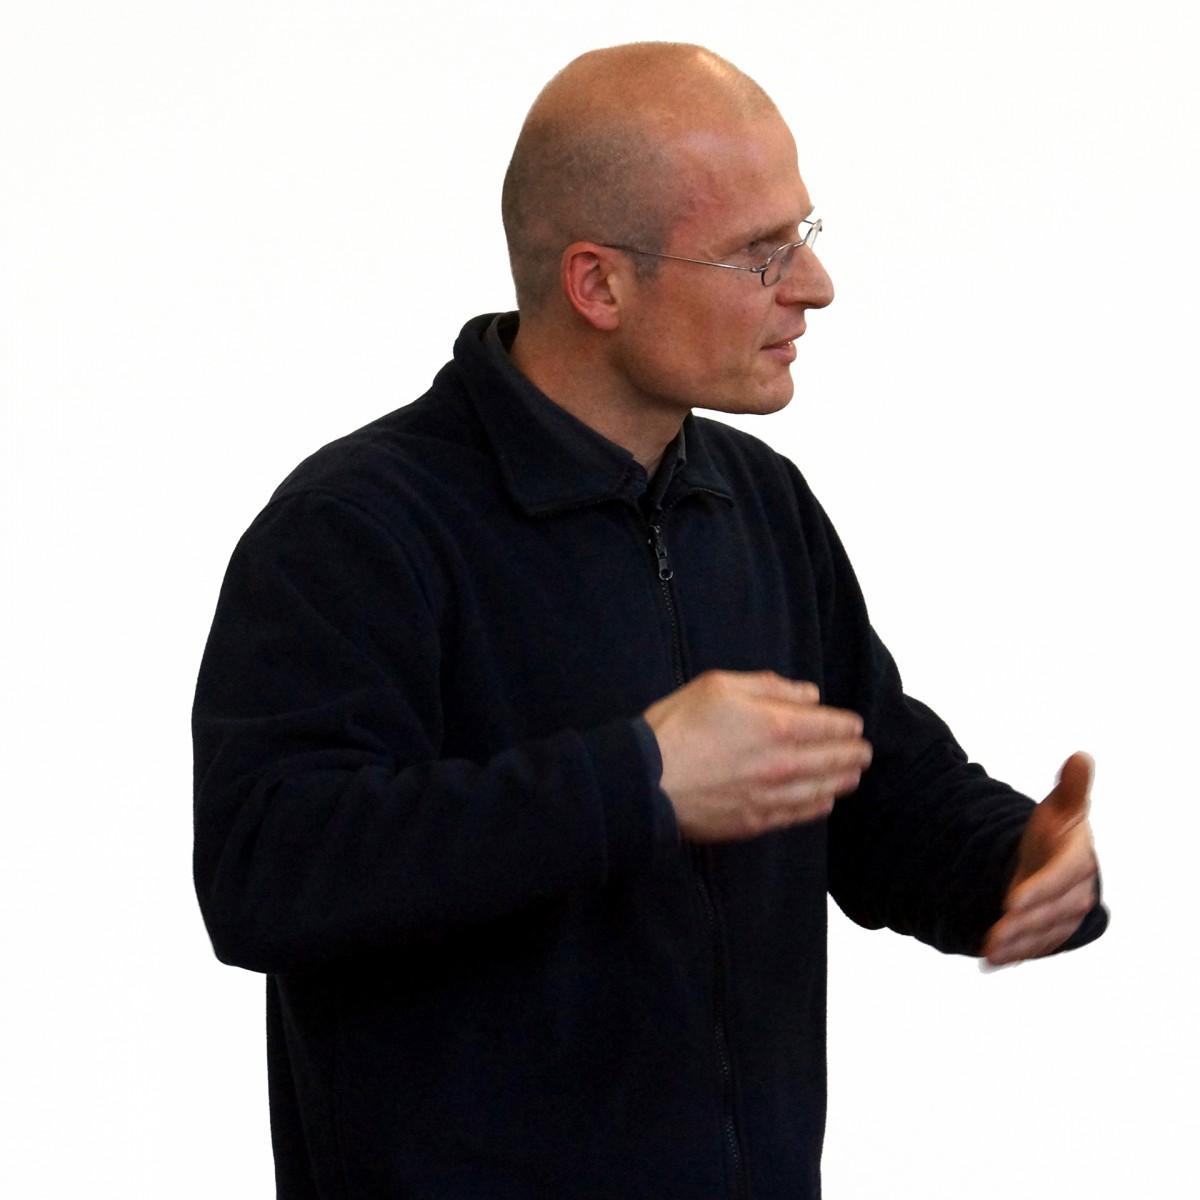 Jürgen Krause (Bild 7): Künstler im Gespräch – Kunsthaus Nürnberg (2015)